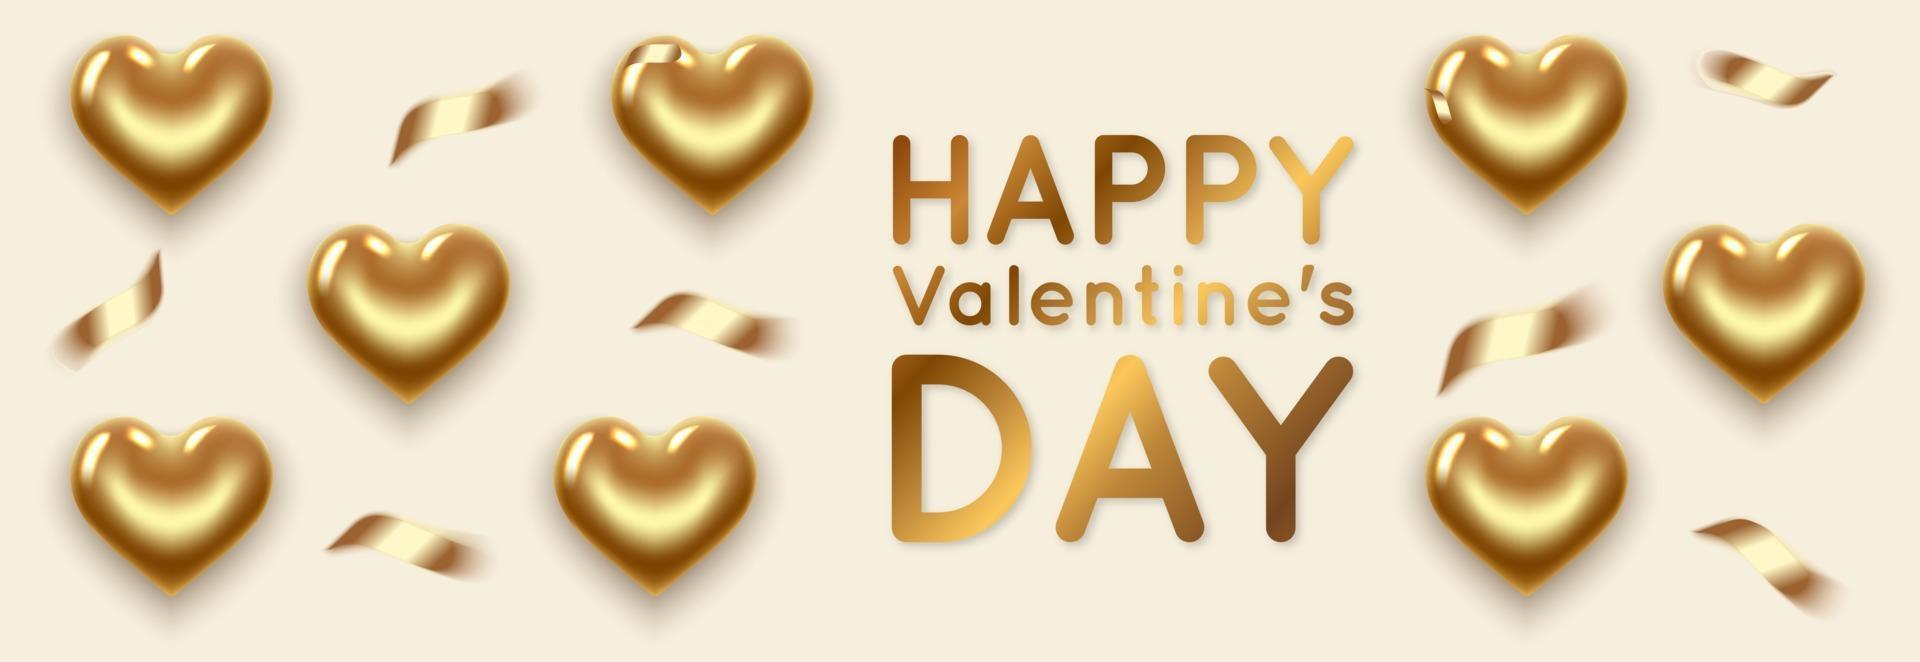 horisontell valentins banner med guldhjärtor vektor